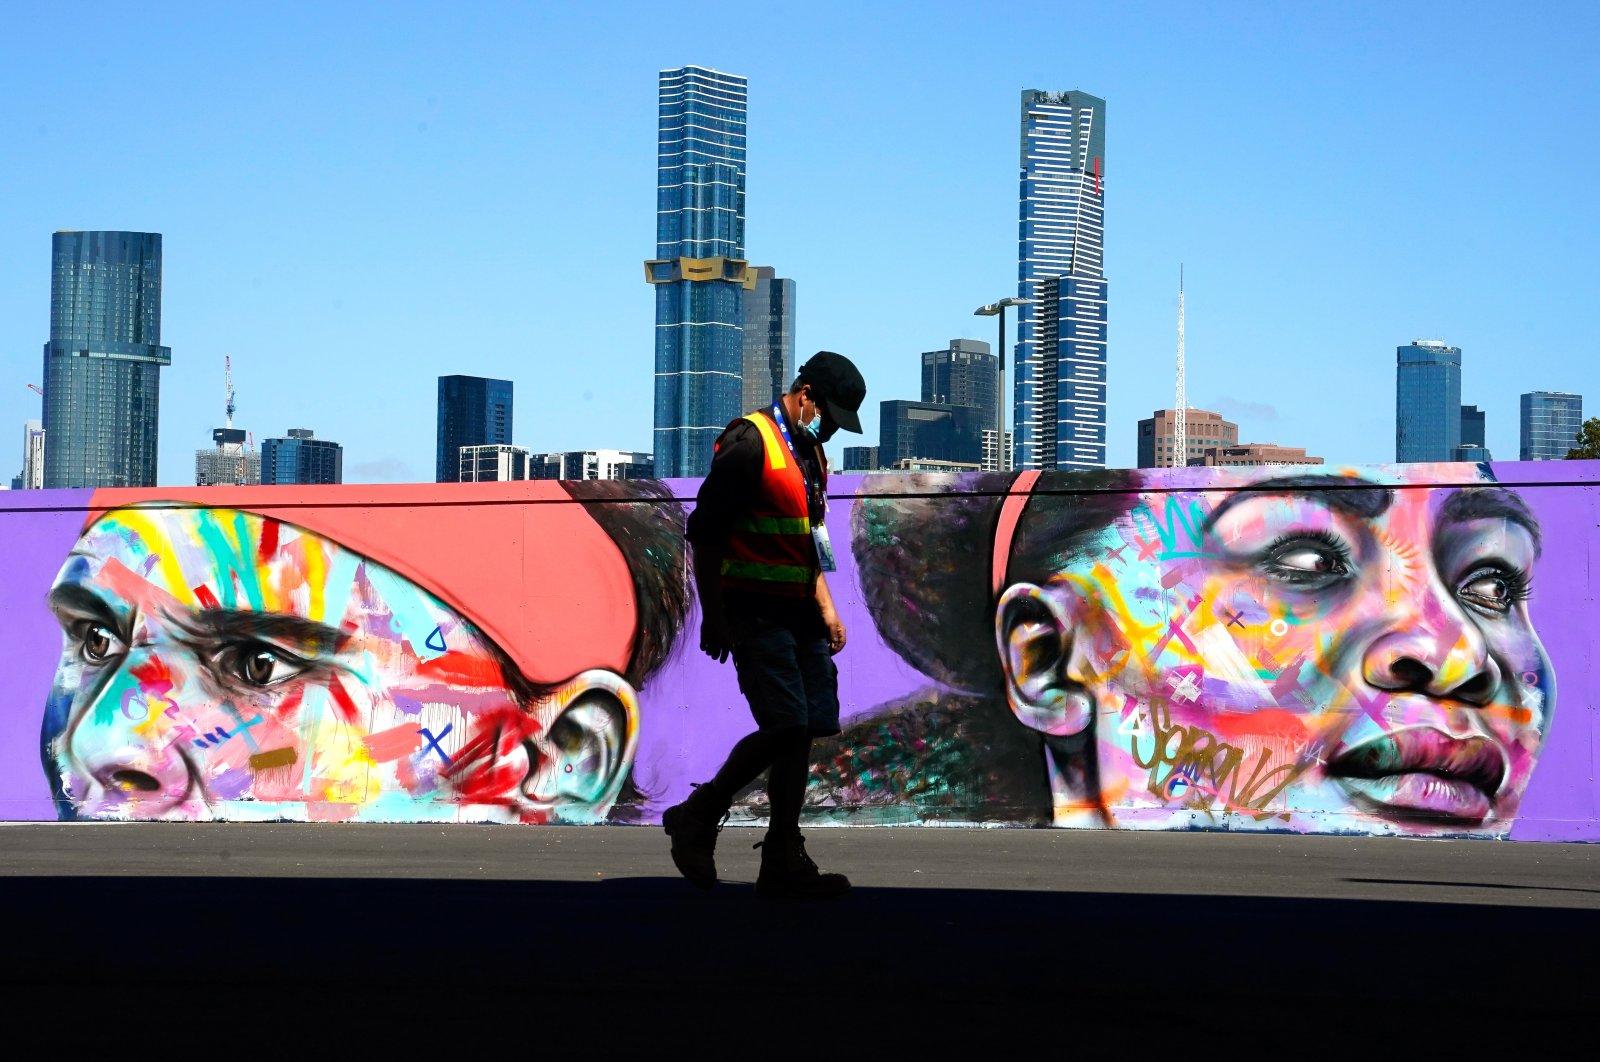 A worker in a protective face mask walks inside the Melbourne Park tennis precinct in Melbourne, Australia, Feb. 3, 2021. (EPA Photo)